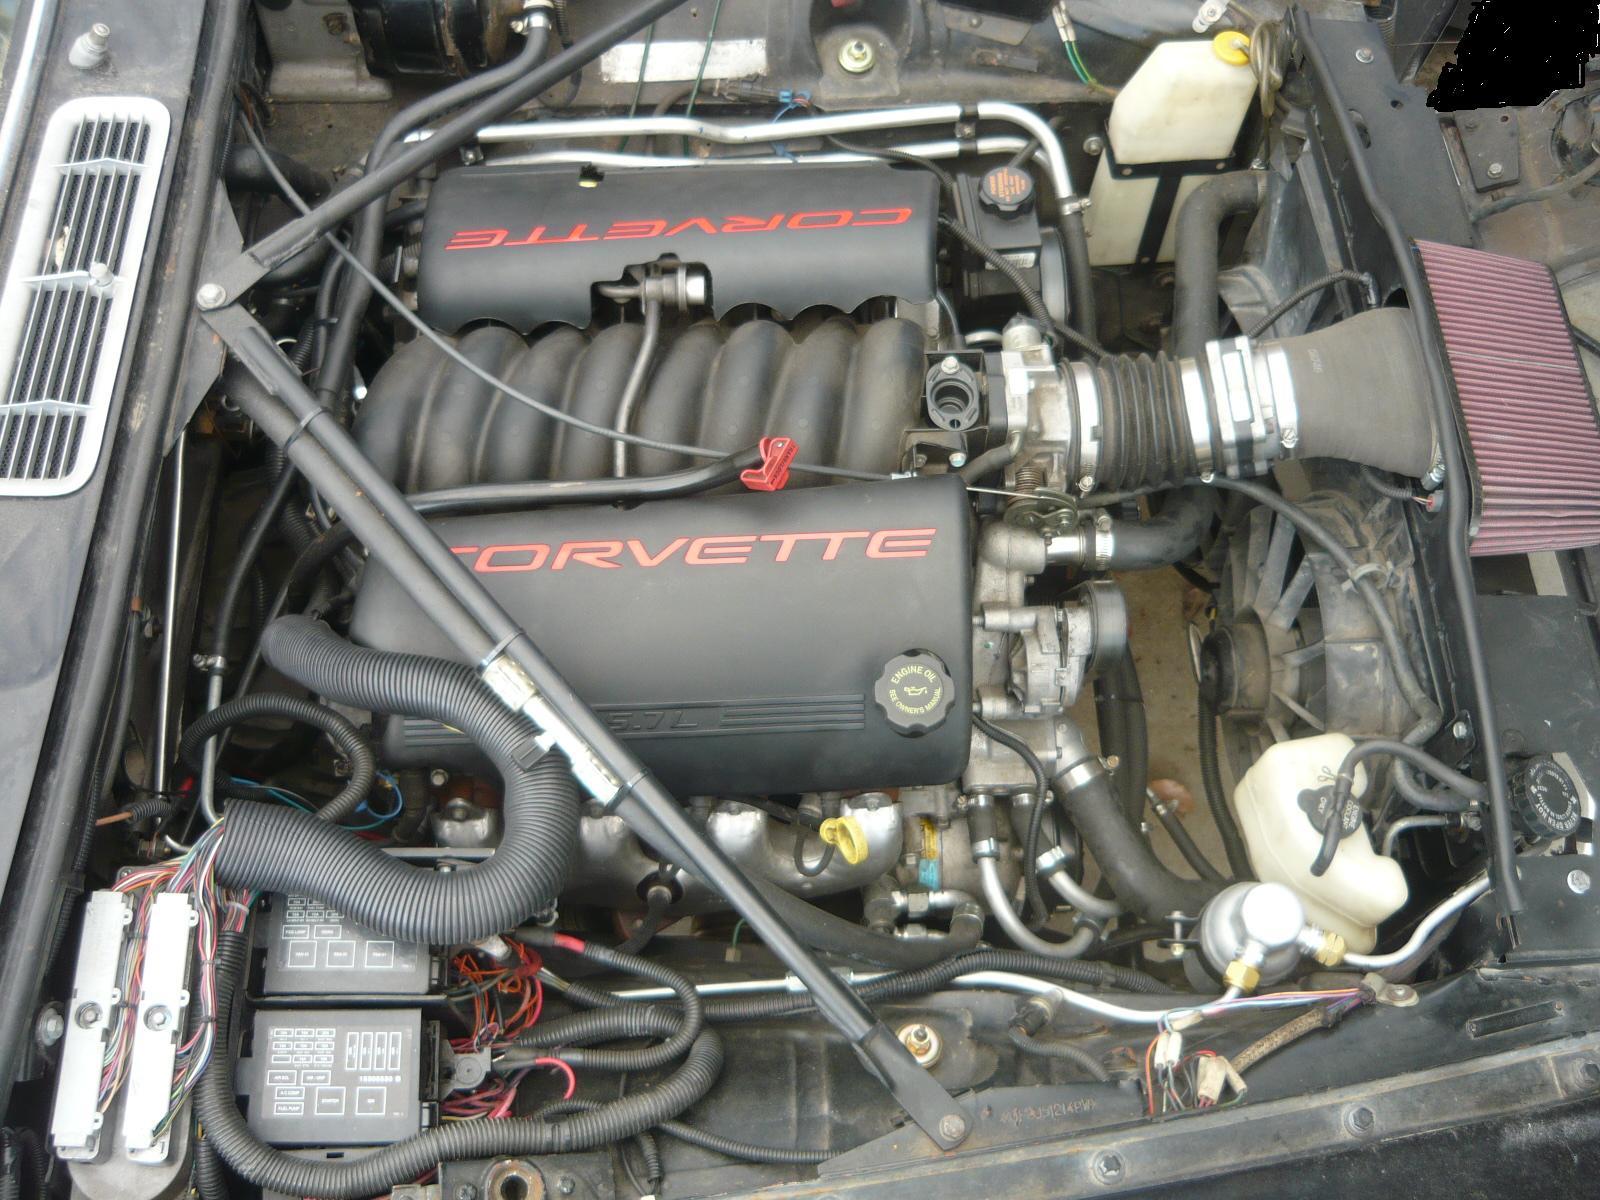 hight resolution of diagram for 2006 jaguar xk8 engine